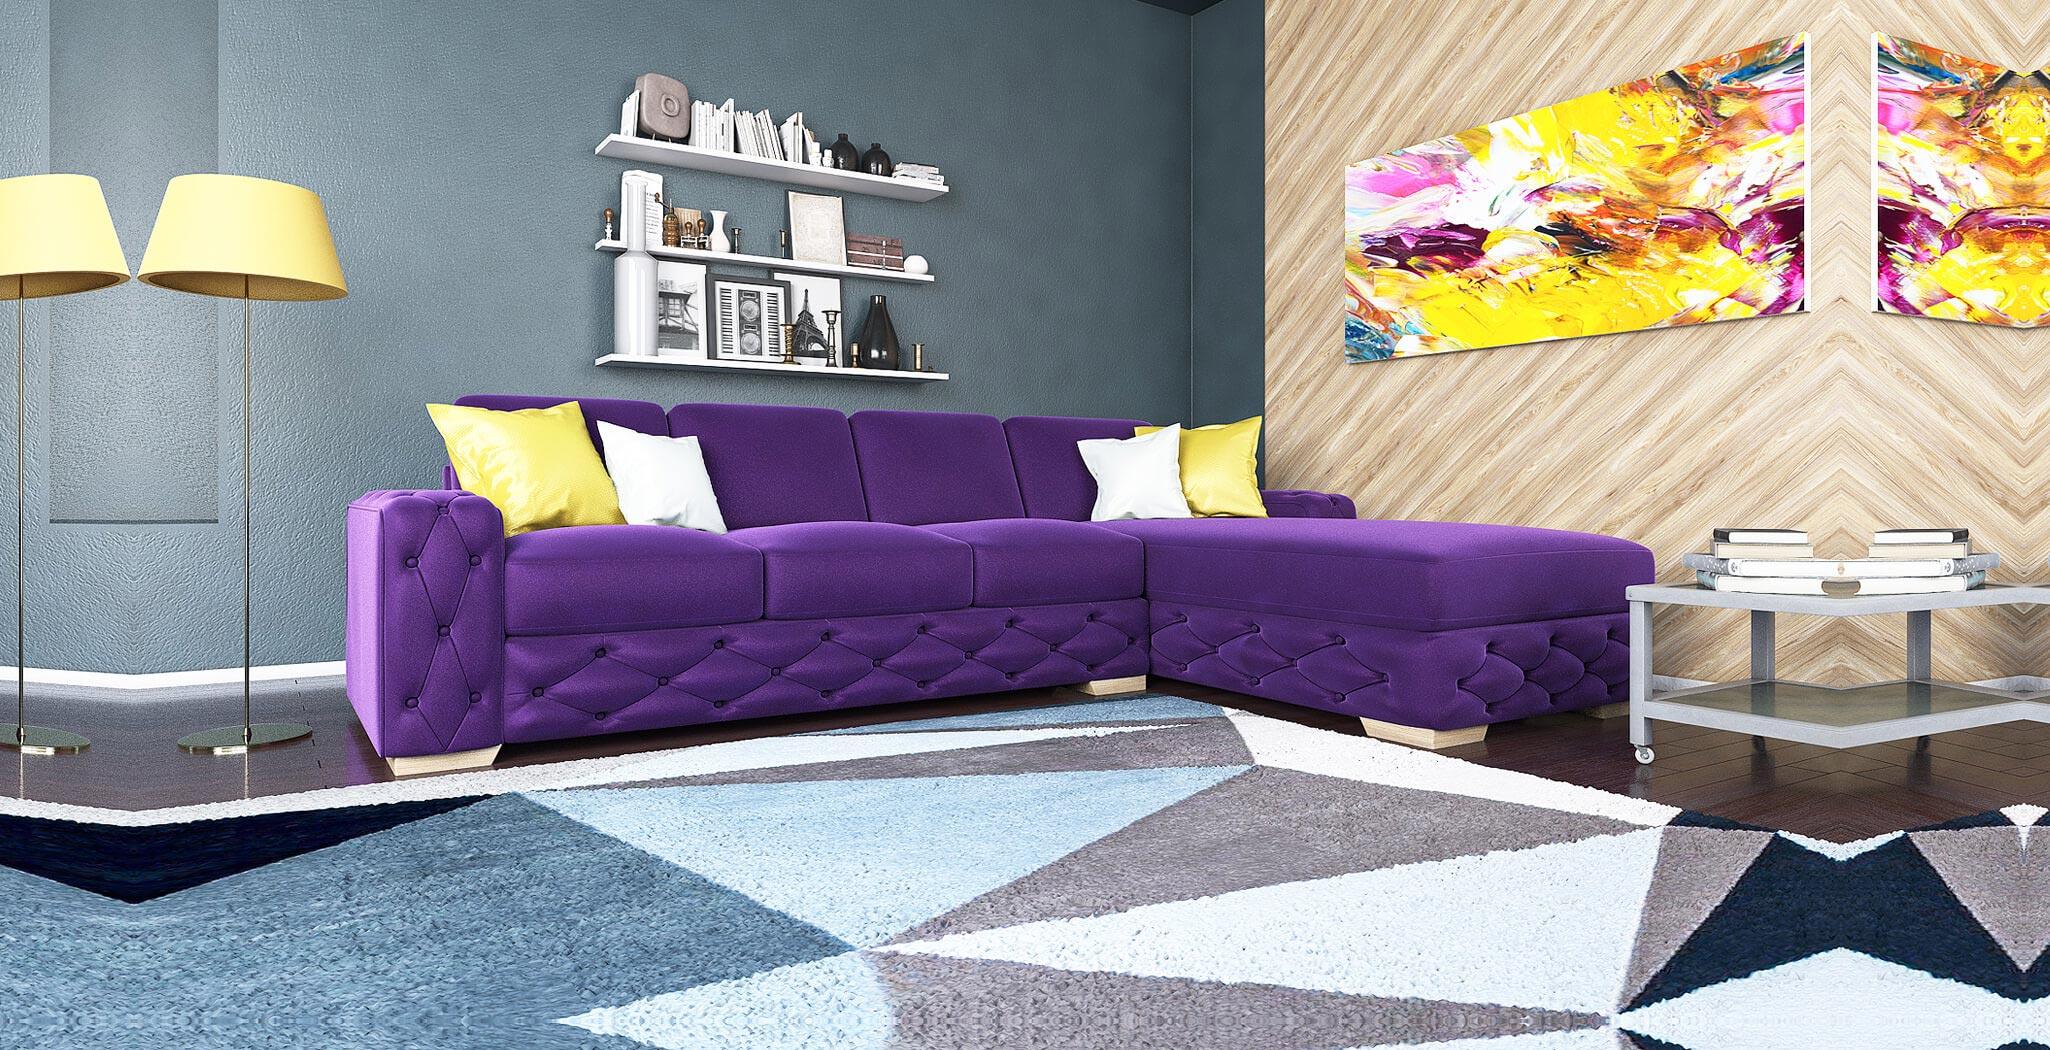 windsor panel furniture gallery 4